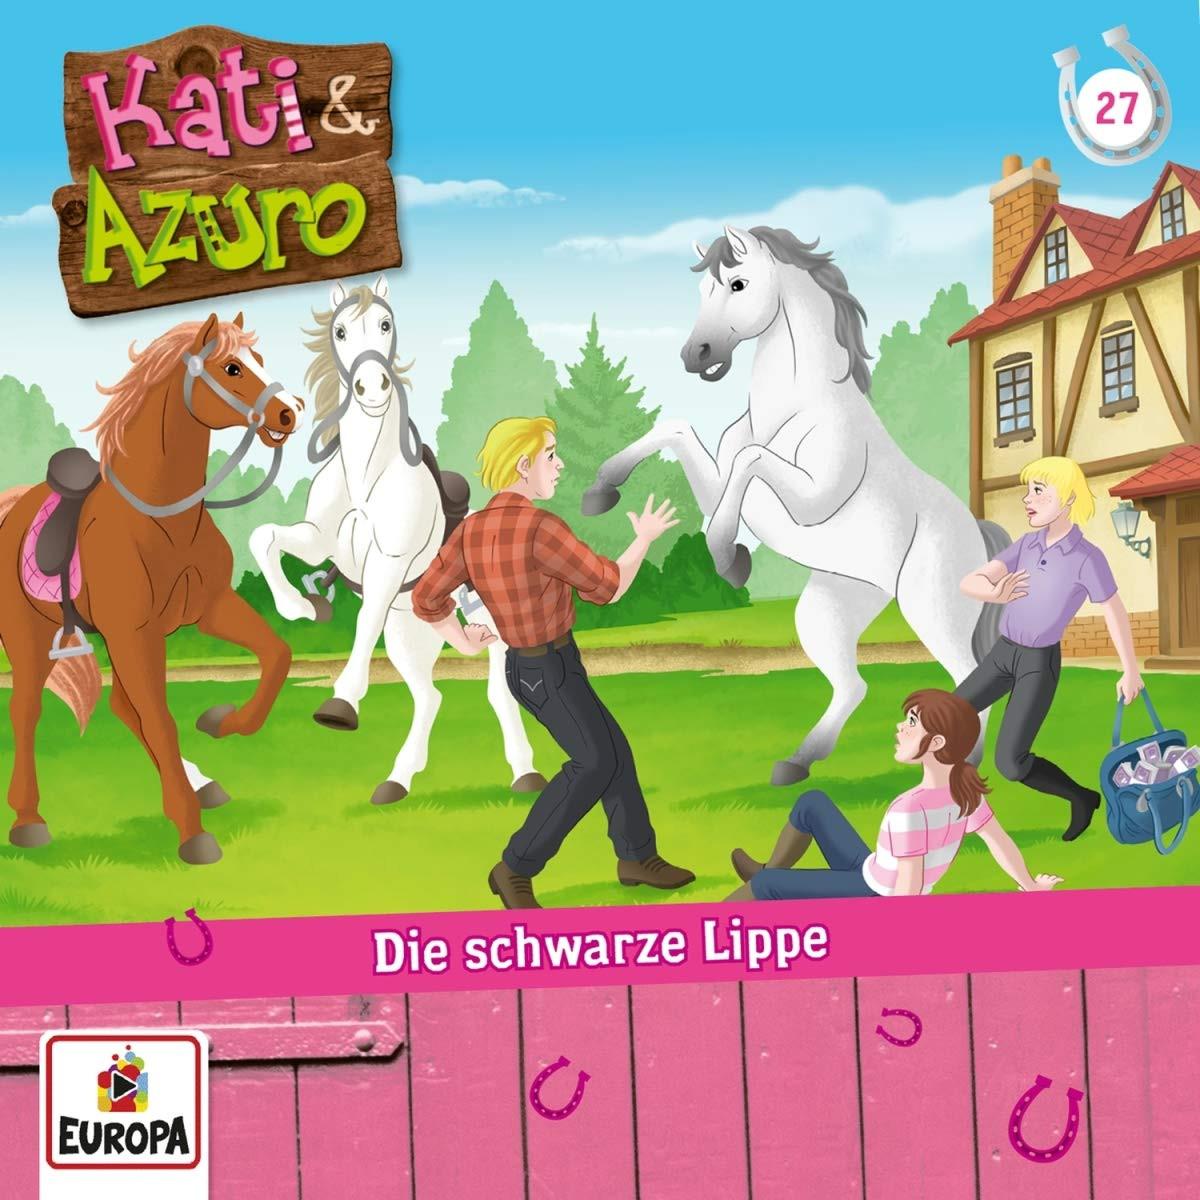 Kati & Azuro - Folge 27: Die schwarze Lippe